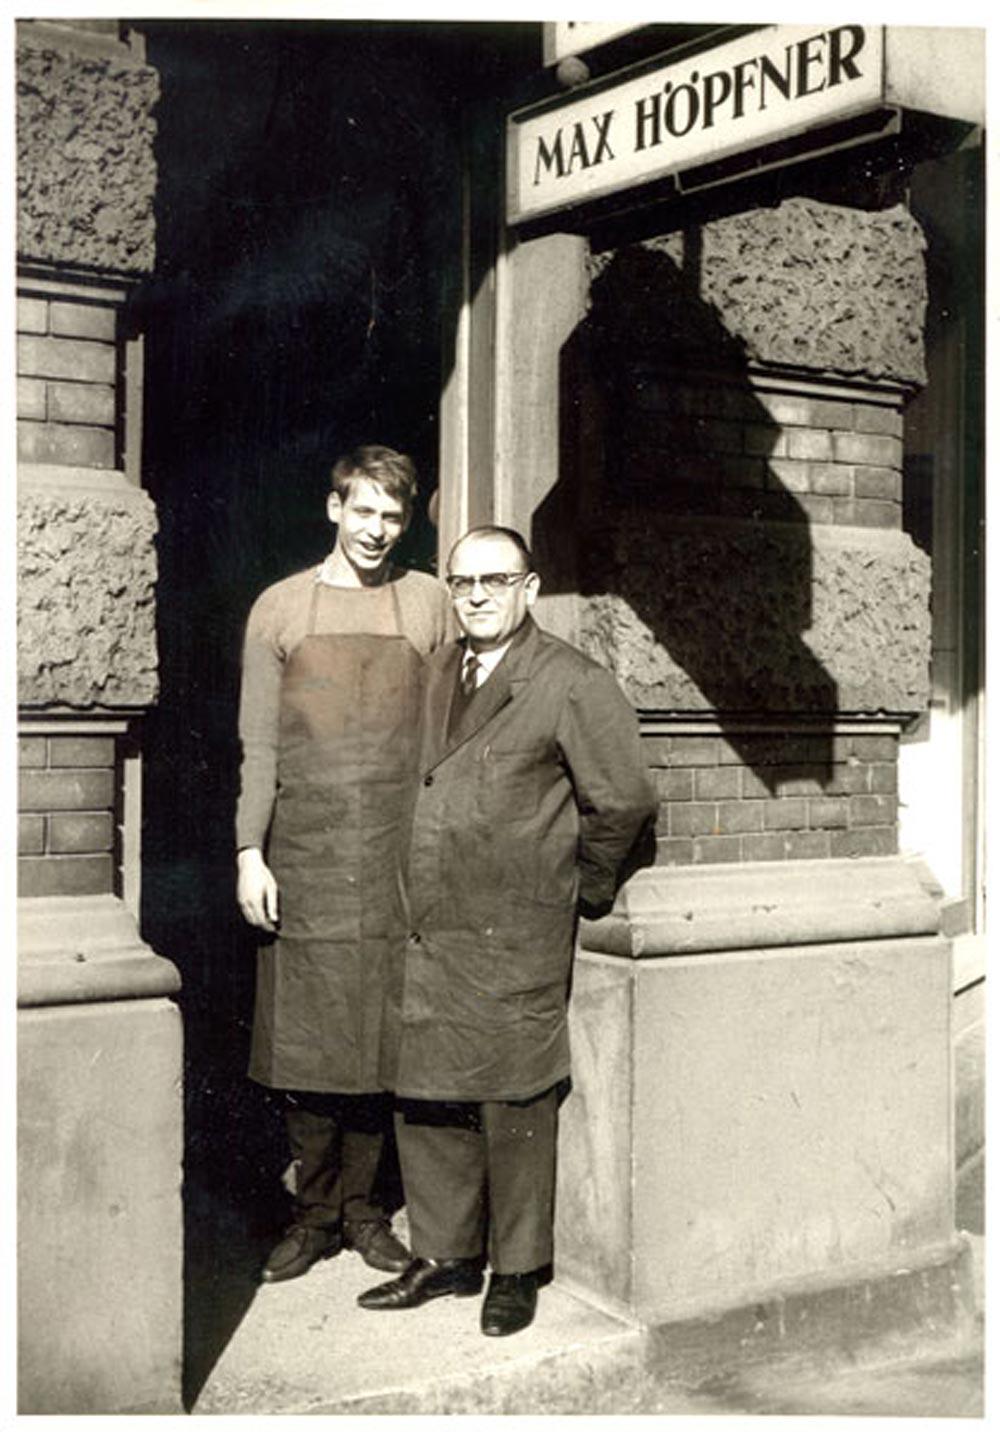 Willy und Wolfgang Hoepfner